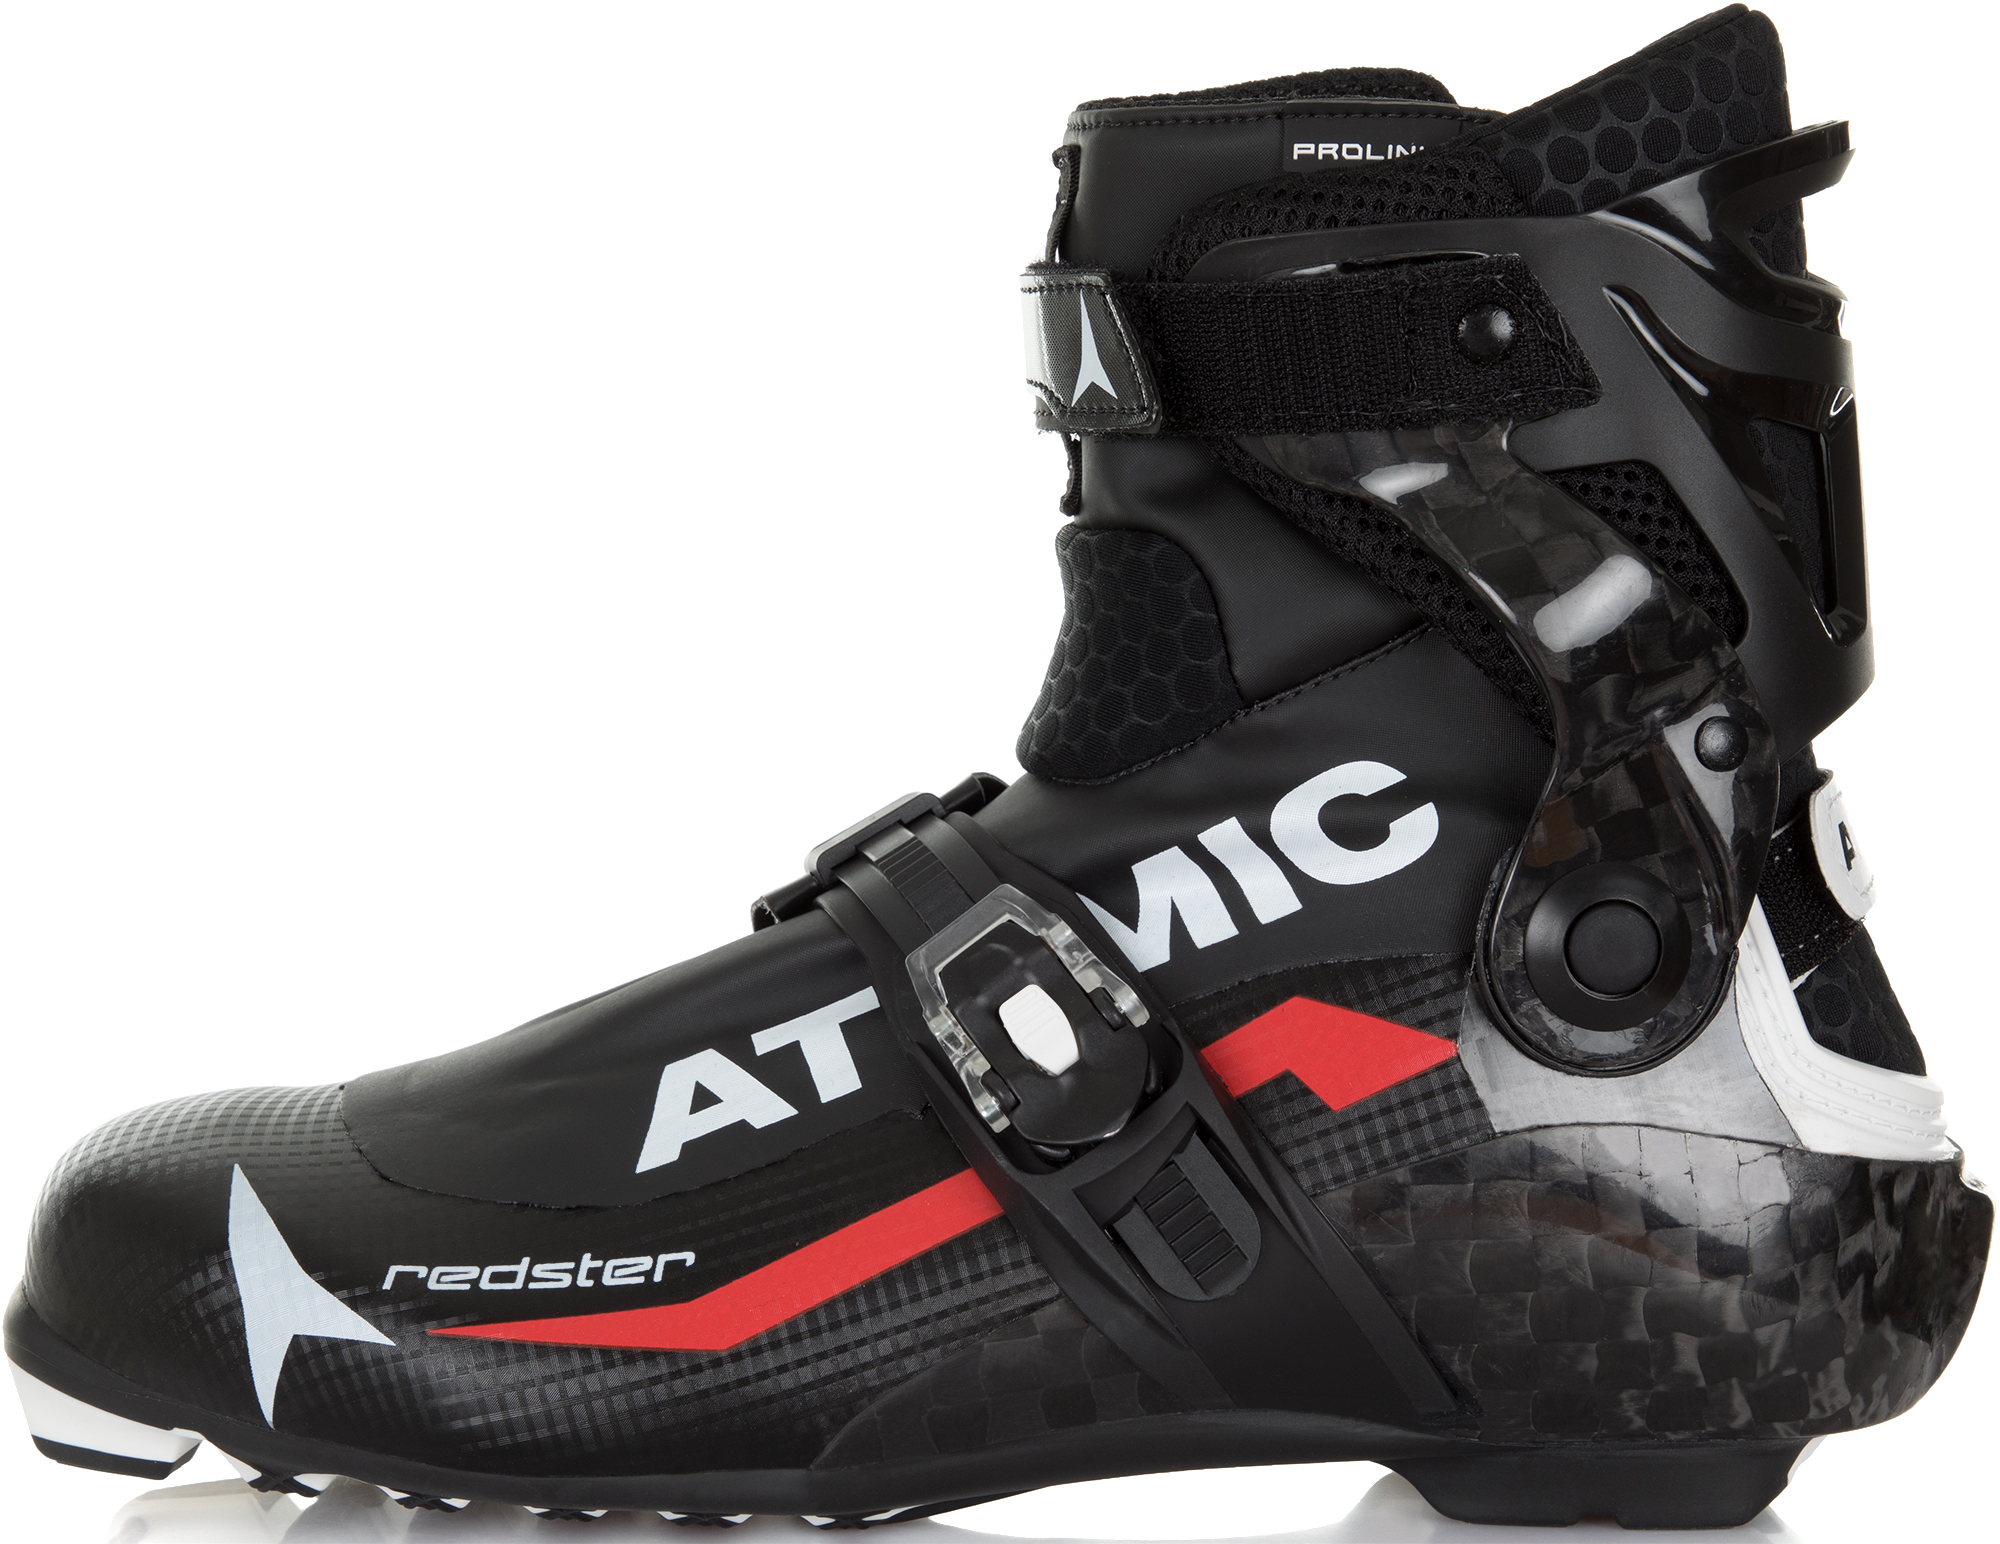 Atomic Ботинки для беговых лыж Atomic Redster World Cup Sk Prolink, размер 45 dfc world cup new